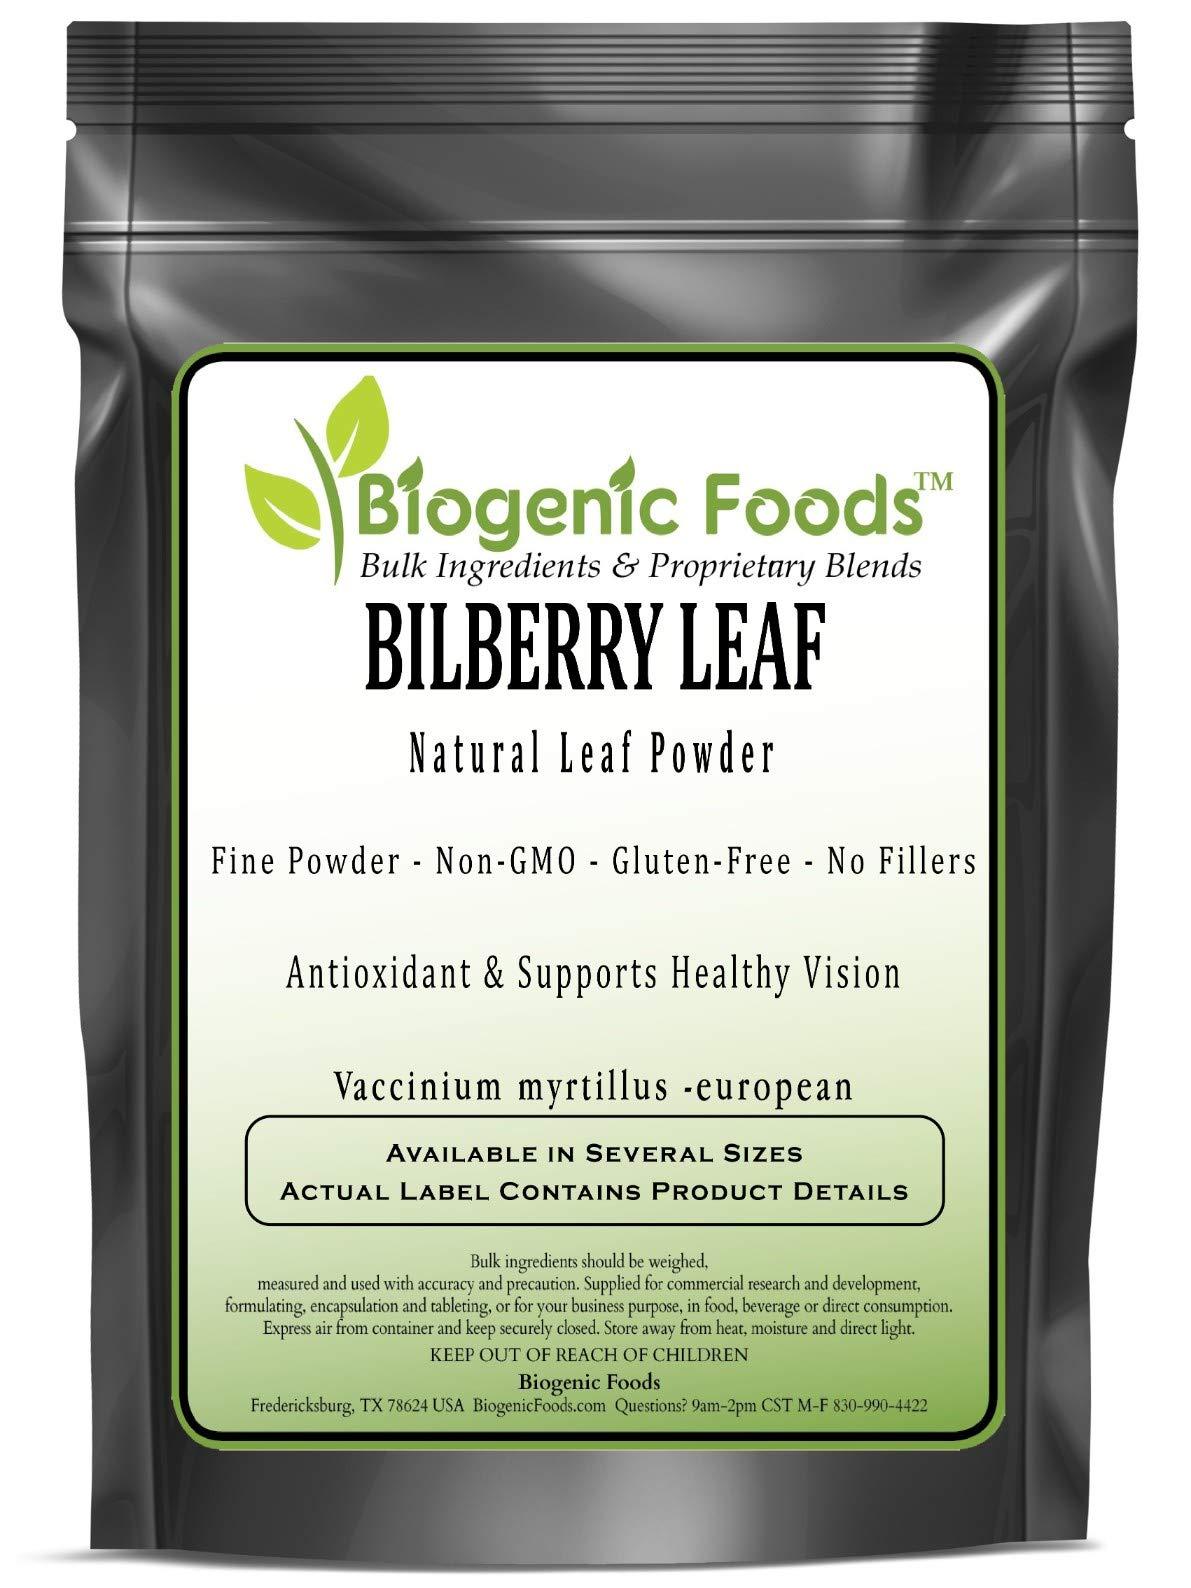 Bilberry Leaf - Natural Leaf Powder (Vaccinium myrtillus -European), 25 kg